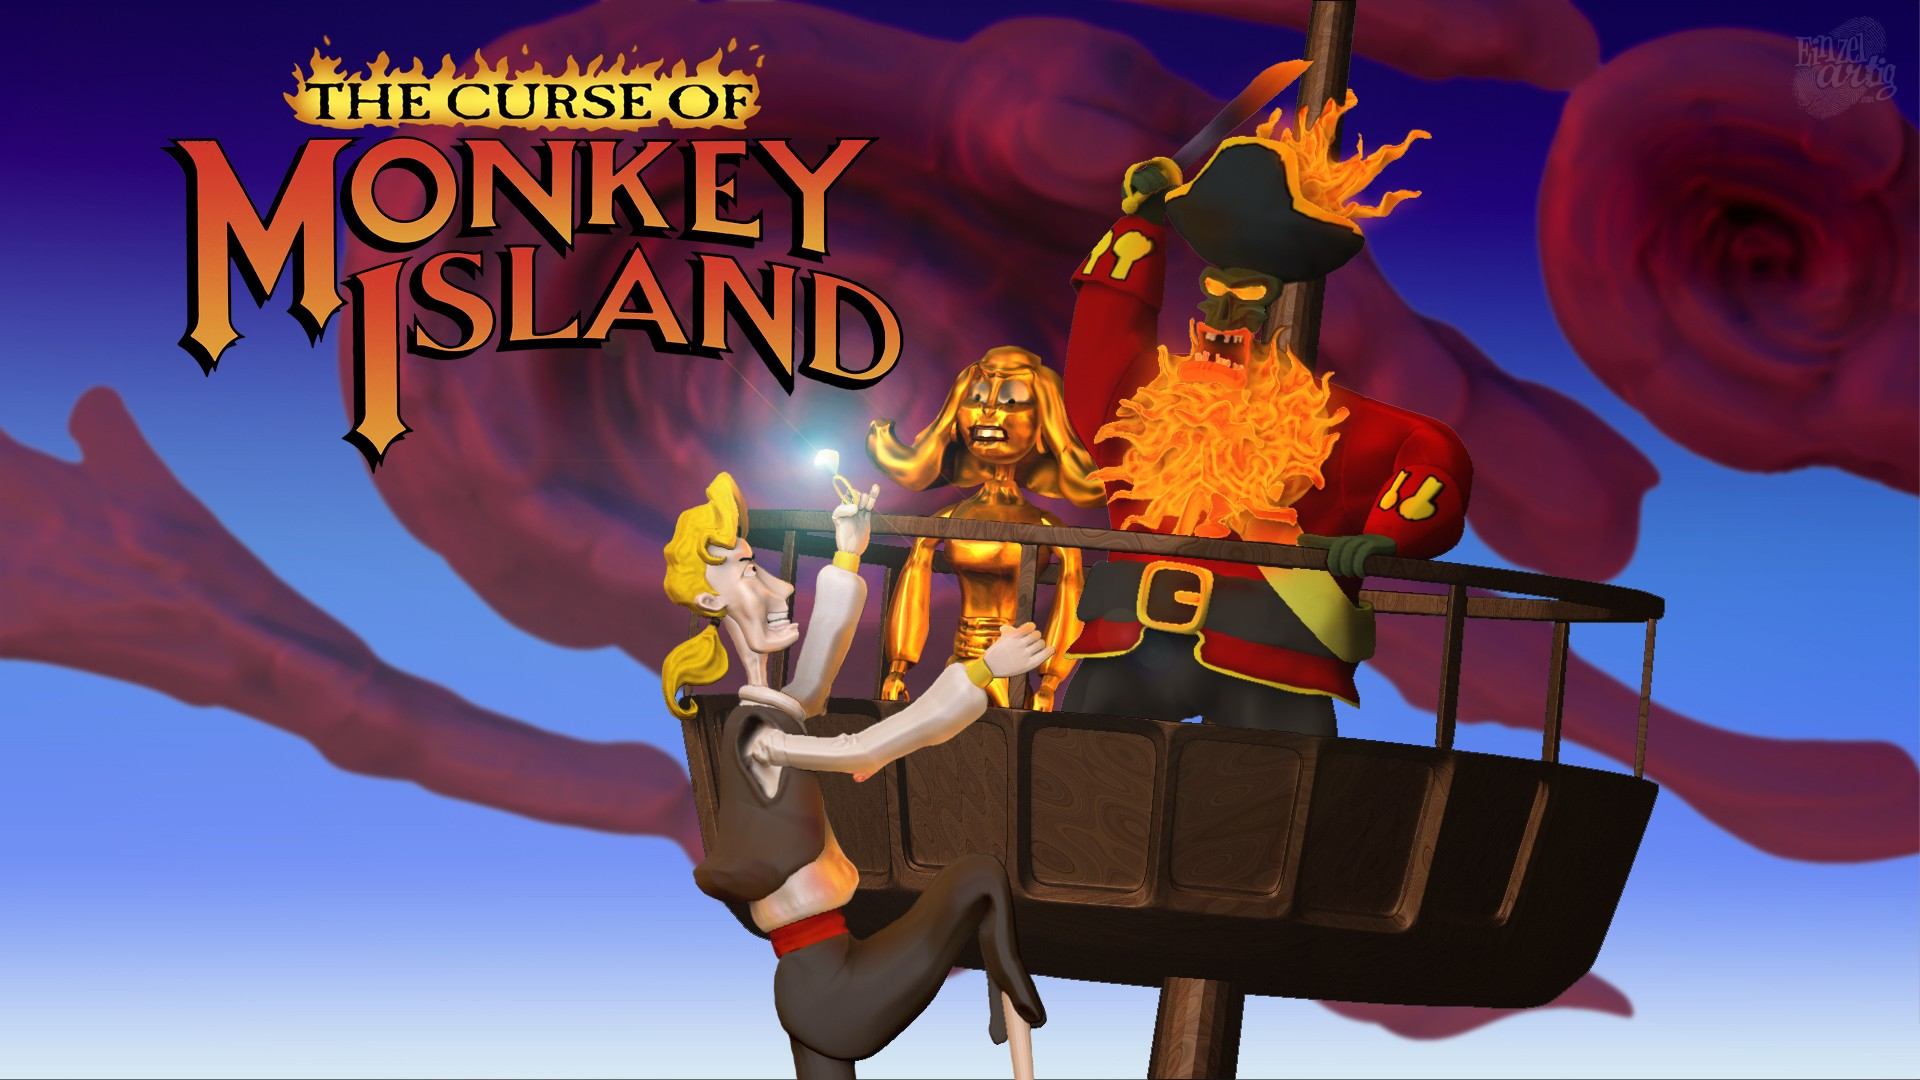 Legends Of The Fall Wallpaper 1 Monkey Island Iii The Curse Of Monkey Island Hd